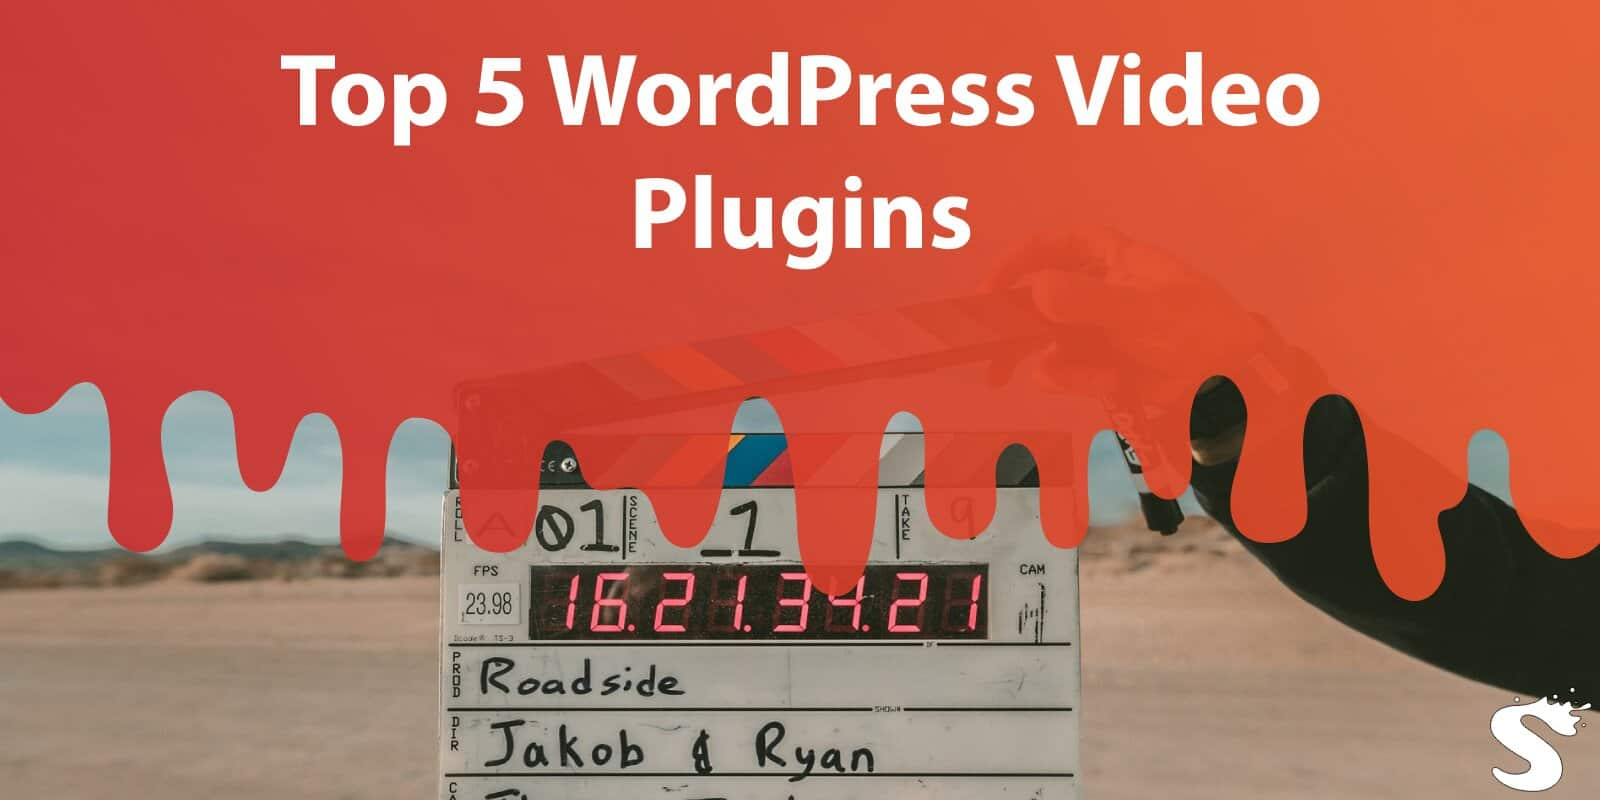 Top 5 Wordpress Video Plugins